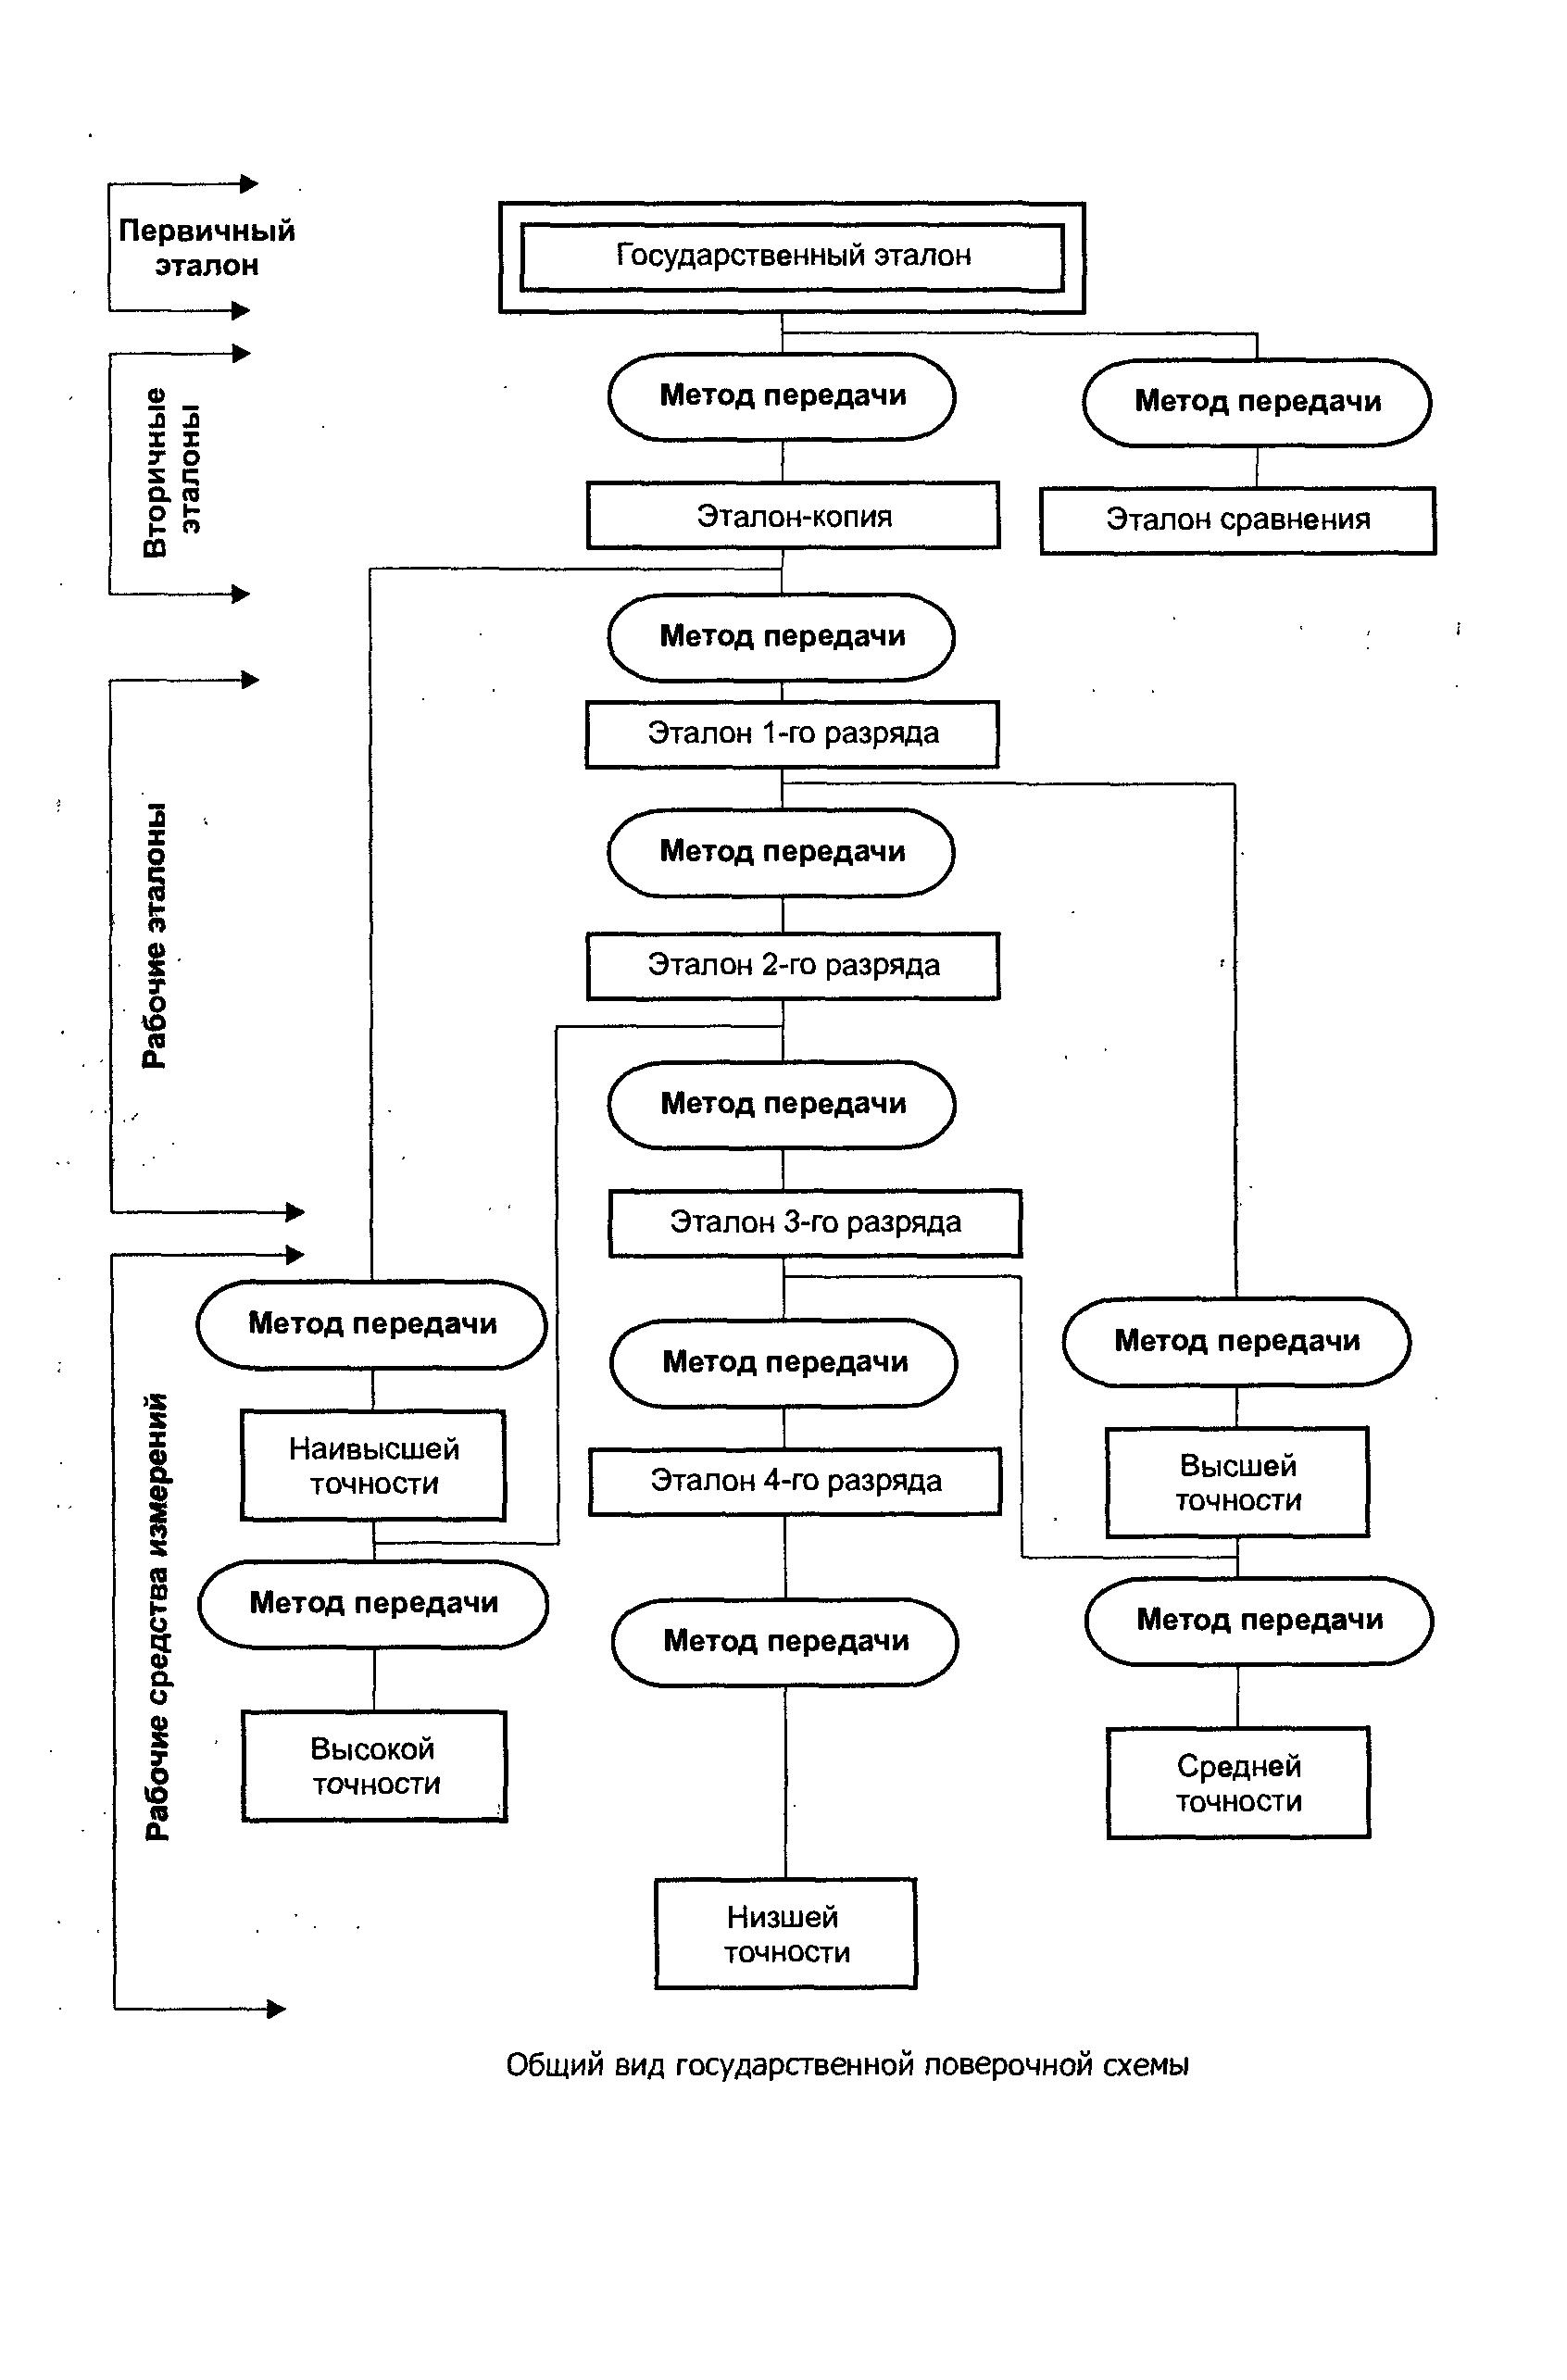 Схема поверки средств измерений фото 197